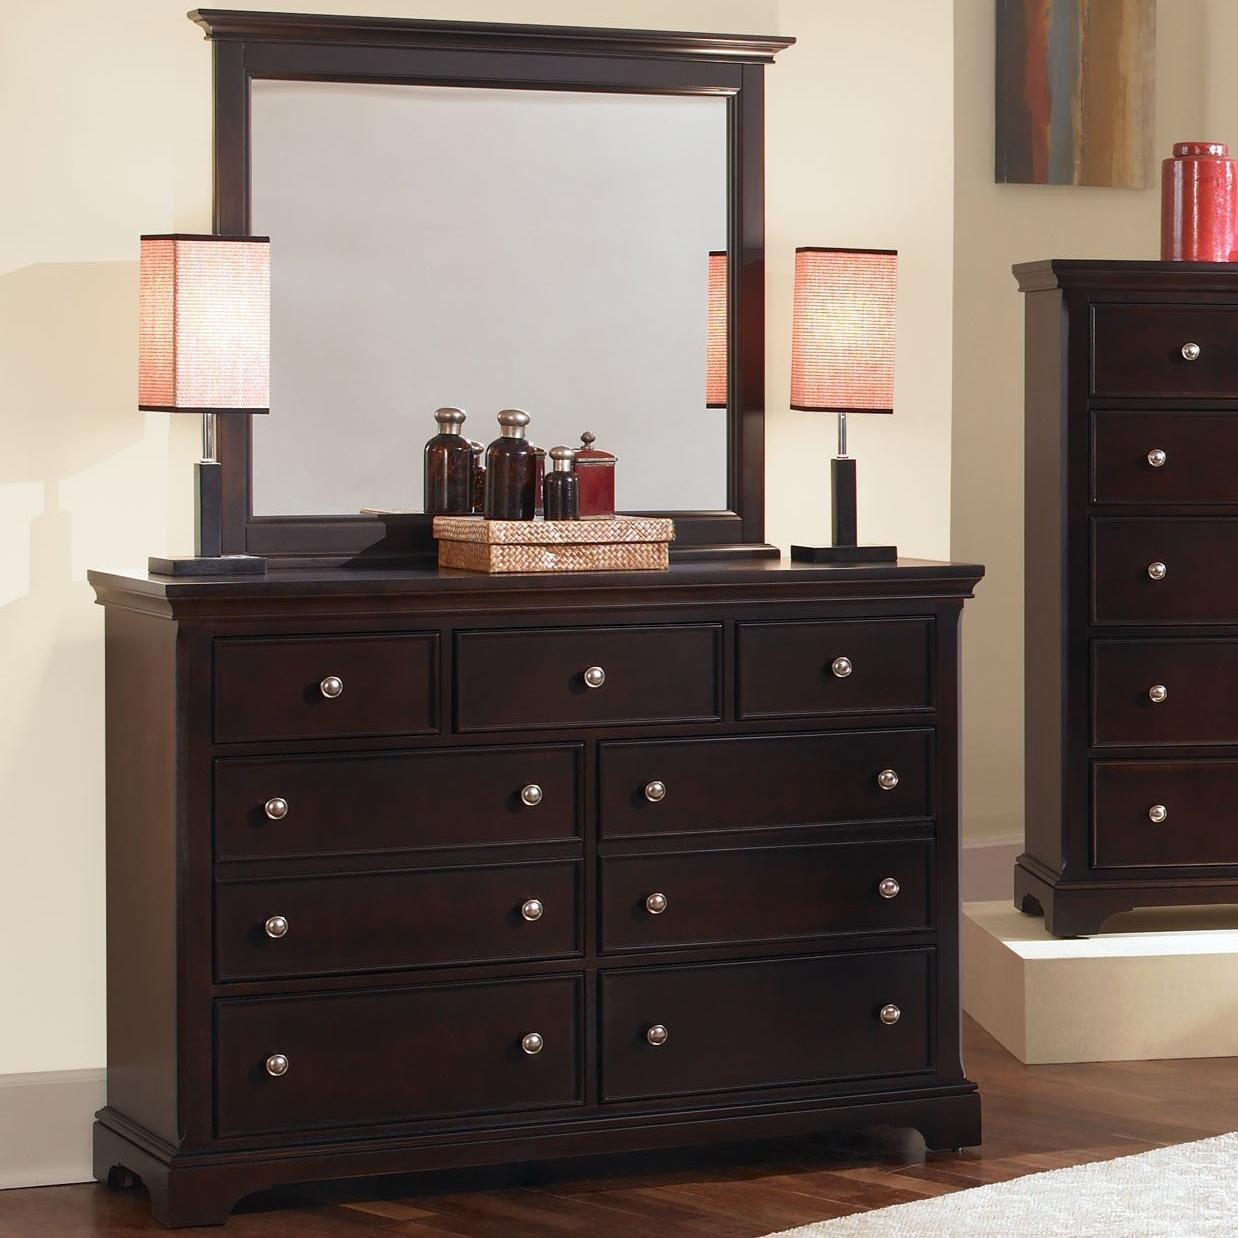 Vaughan Bassett Forsyth 7 Drawer Dresser and Mirror - Item Number: BB76-002+446